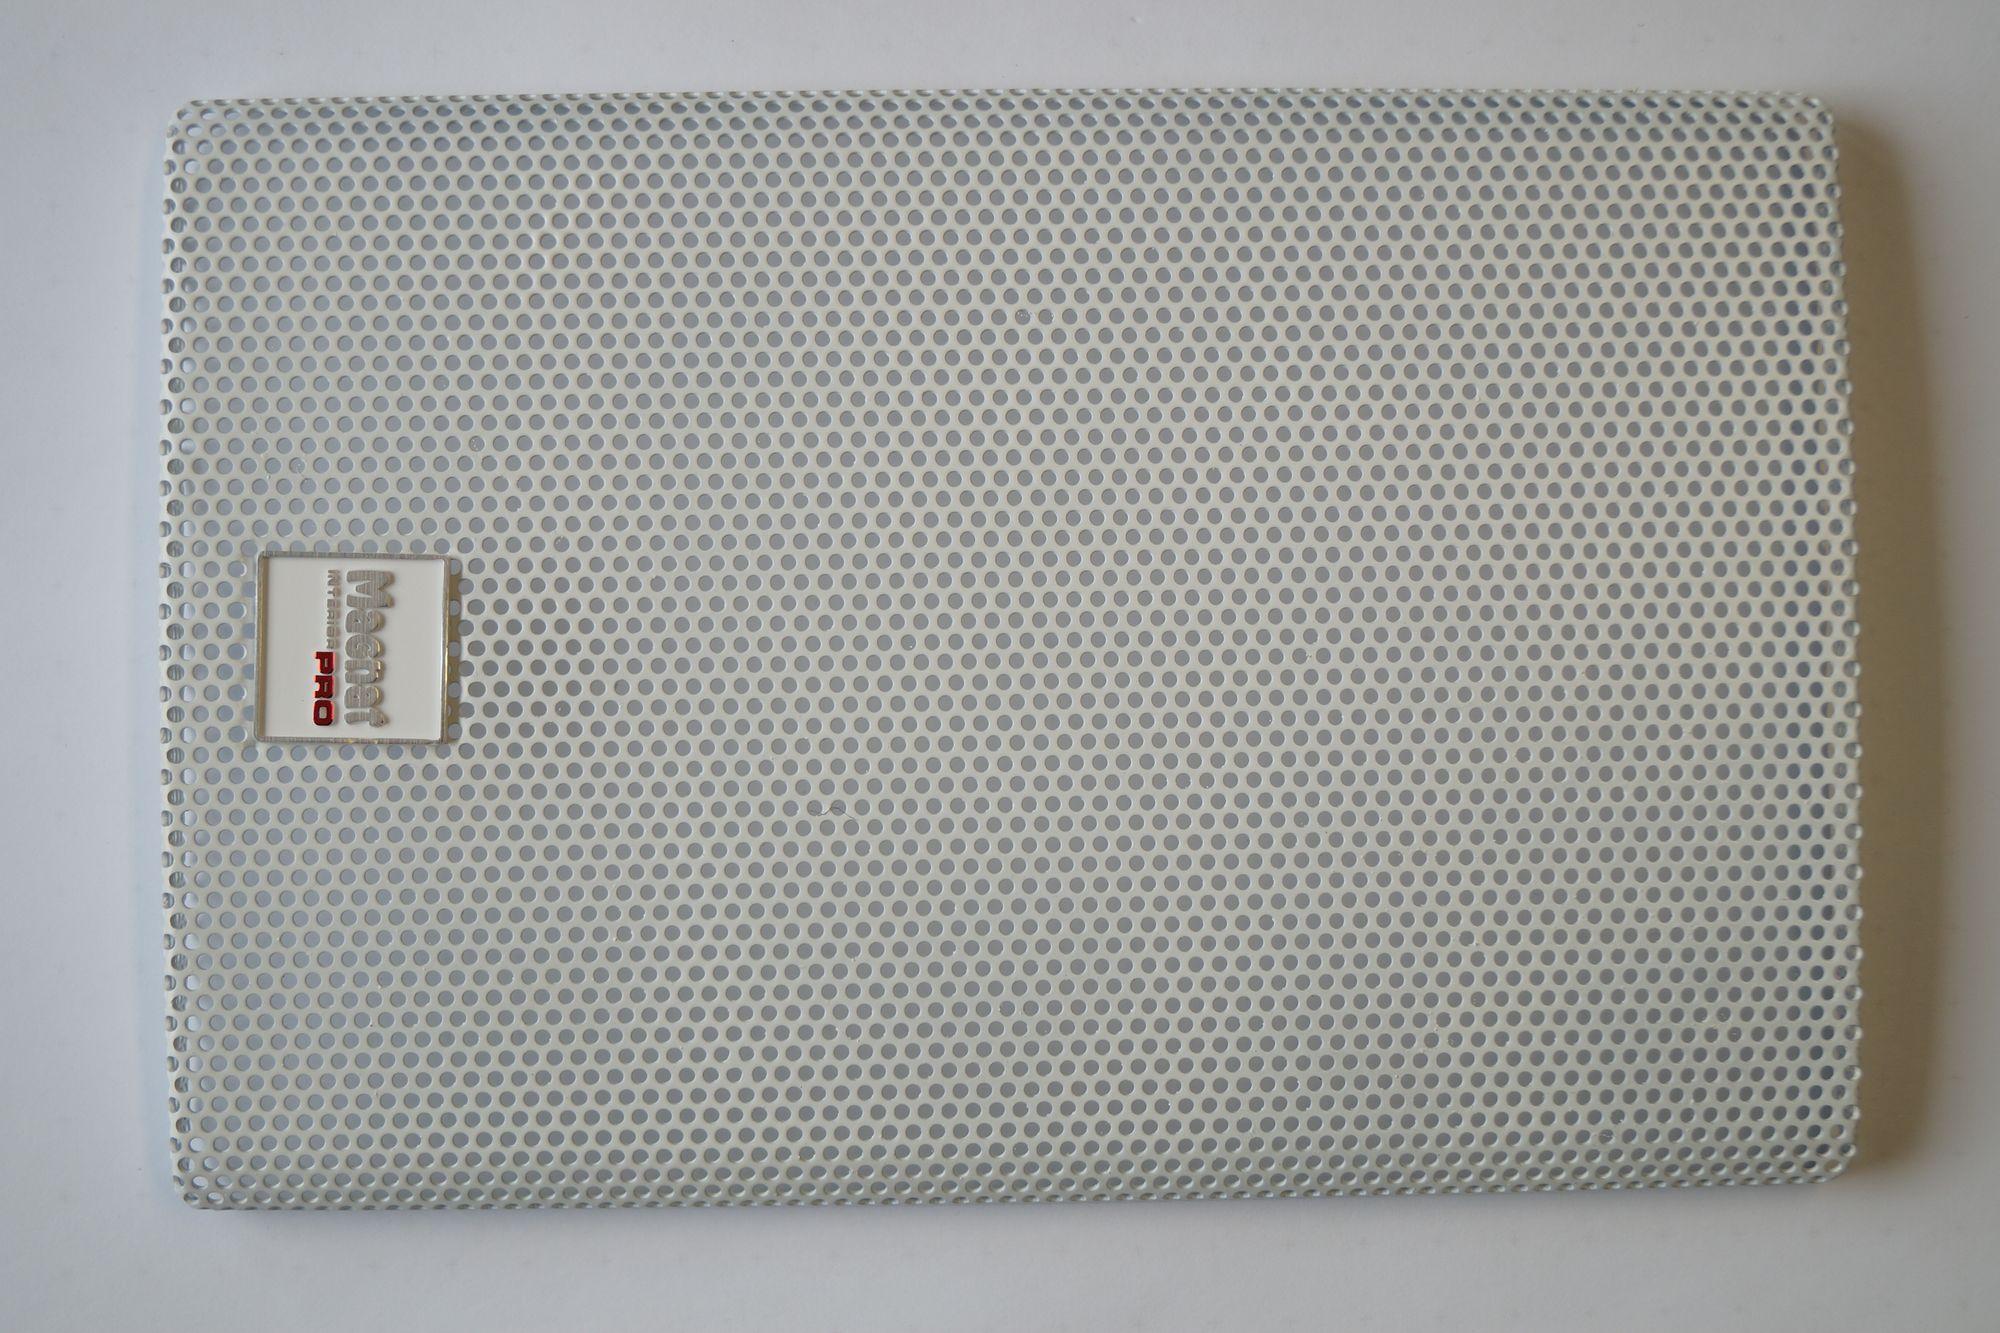 1 Stück Magnat Interior Pro Lautsprecherabdeckung weiß Neu 001